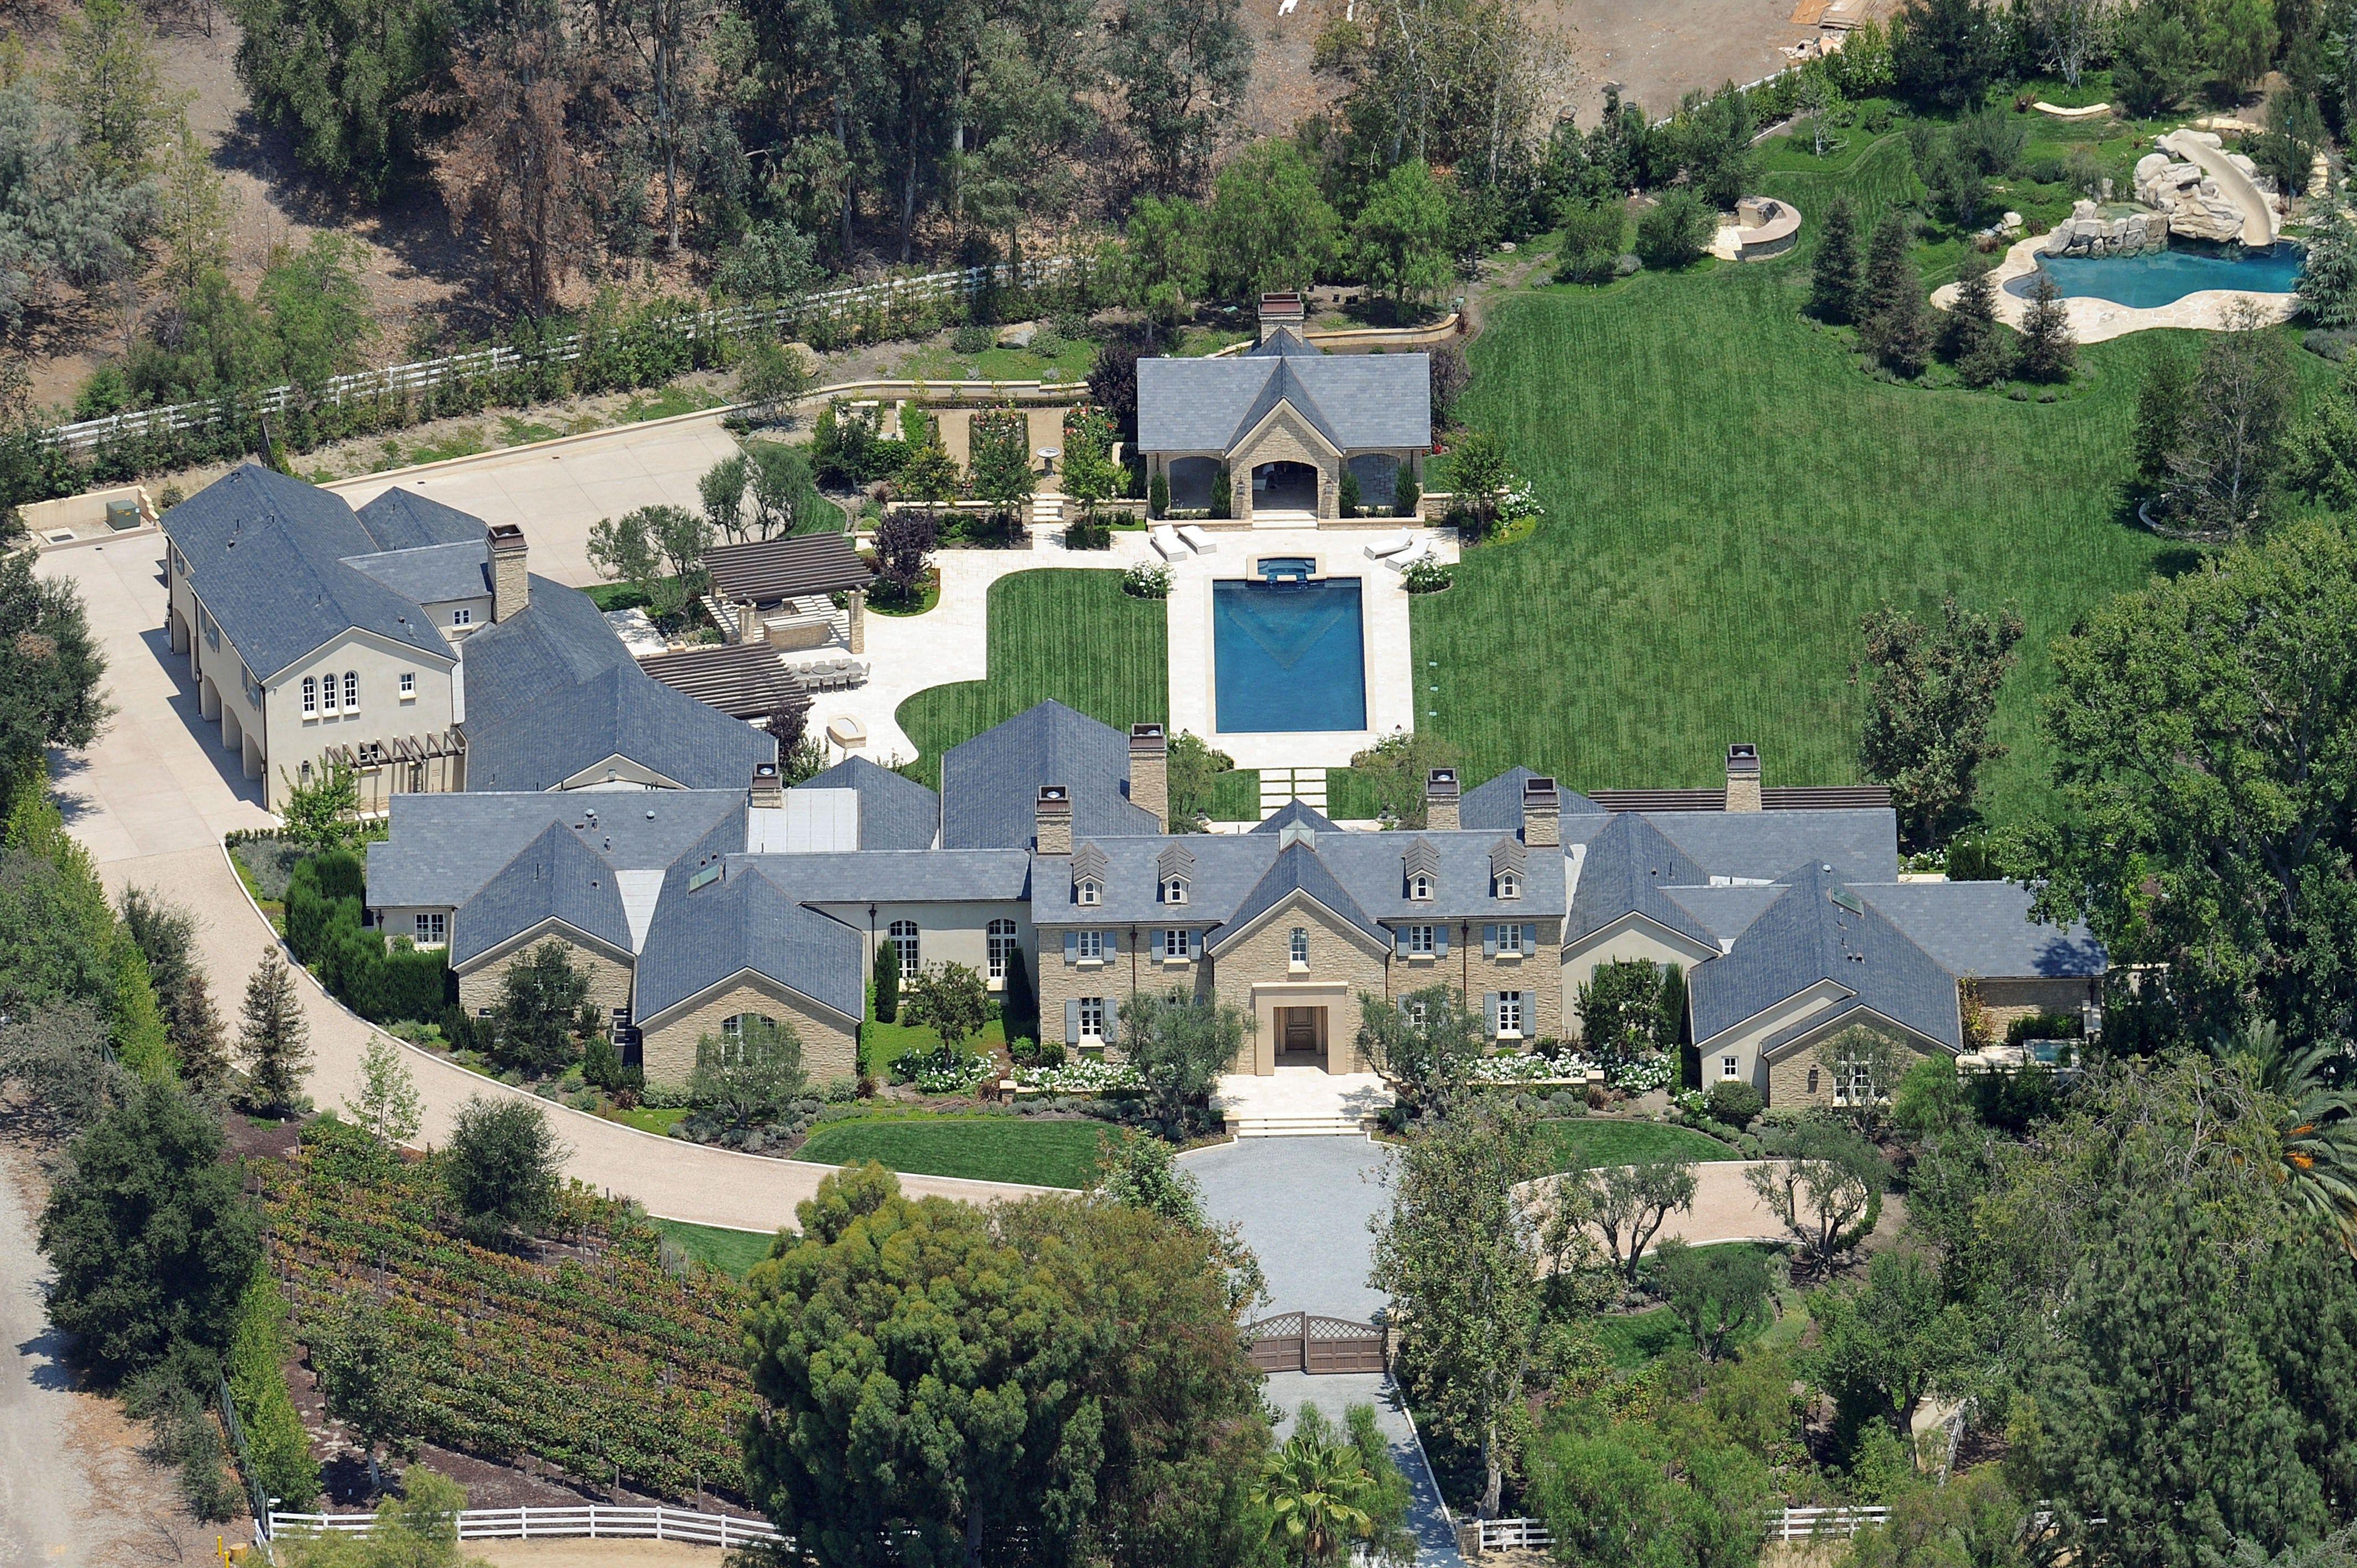 Kim Kardashian And Kanye West Move Into 20 Million Mansion In Hidden Hills Leave Kris Jenner S House Kardashians House Mansions Kim Kardashians House